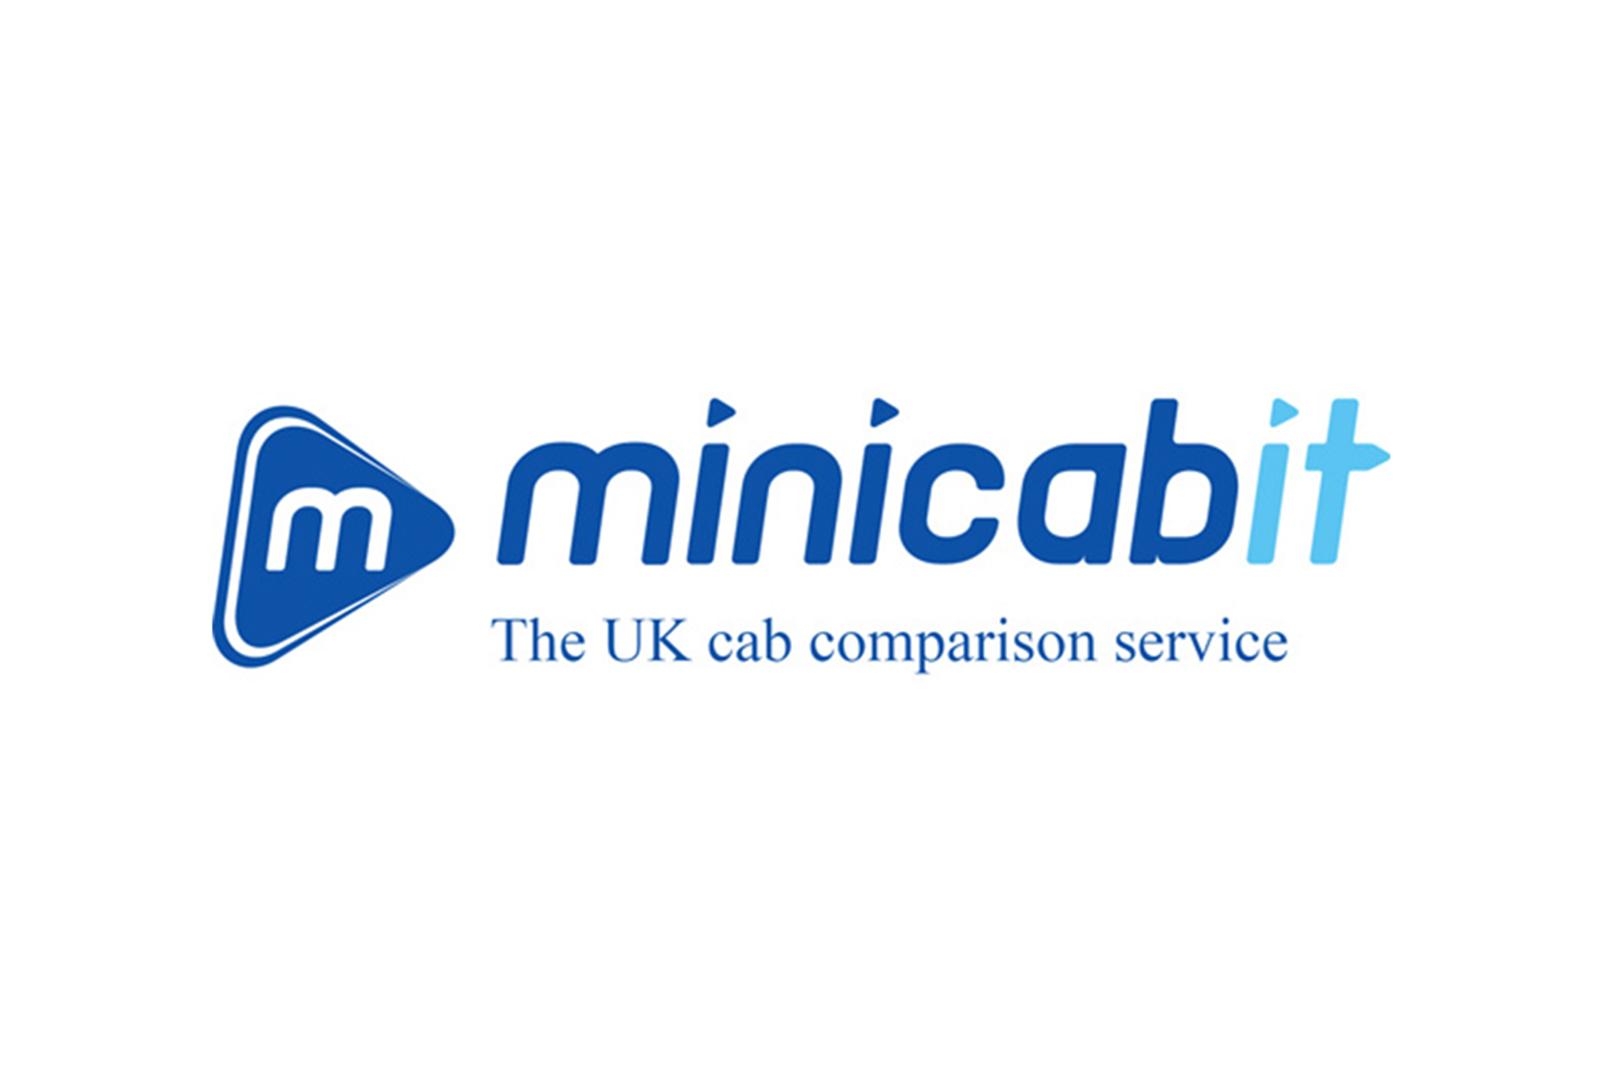 minicabit-logo